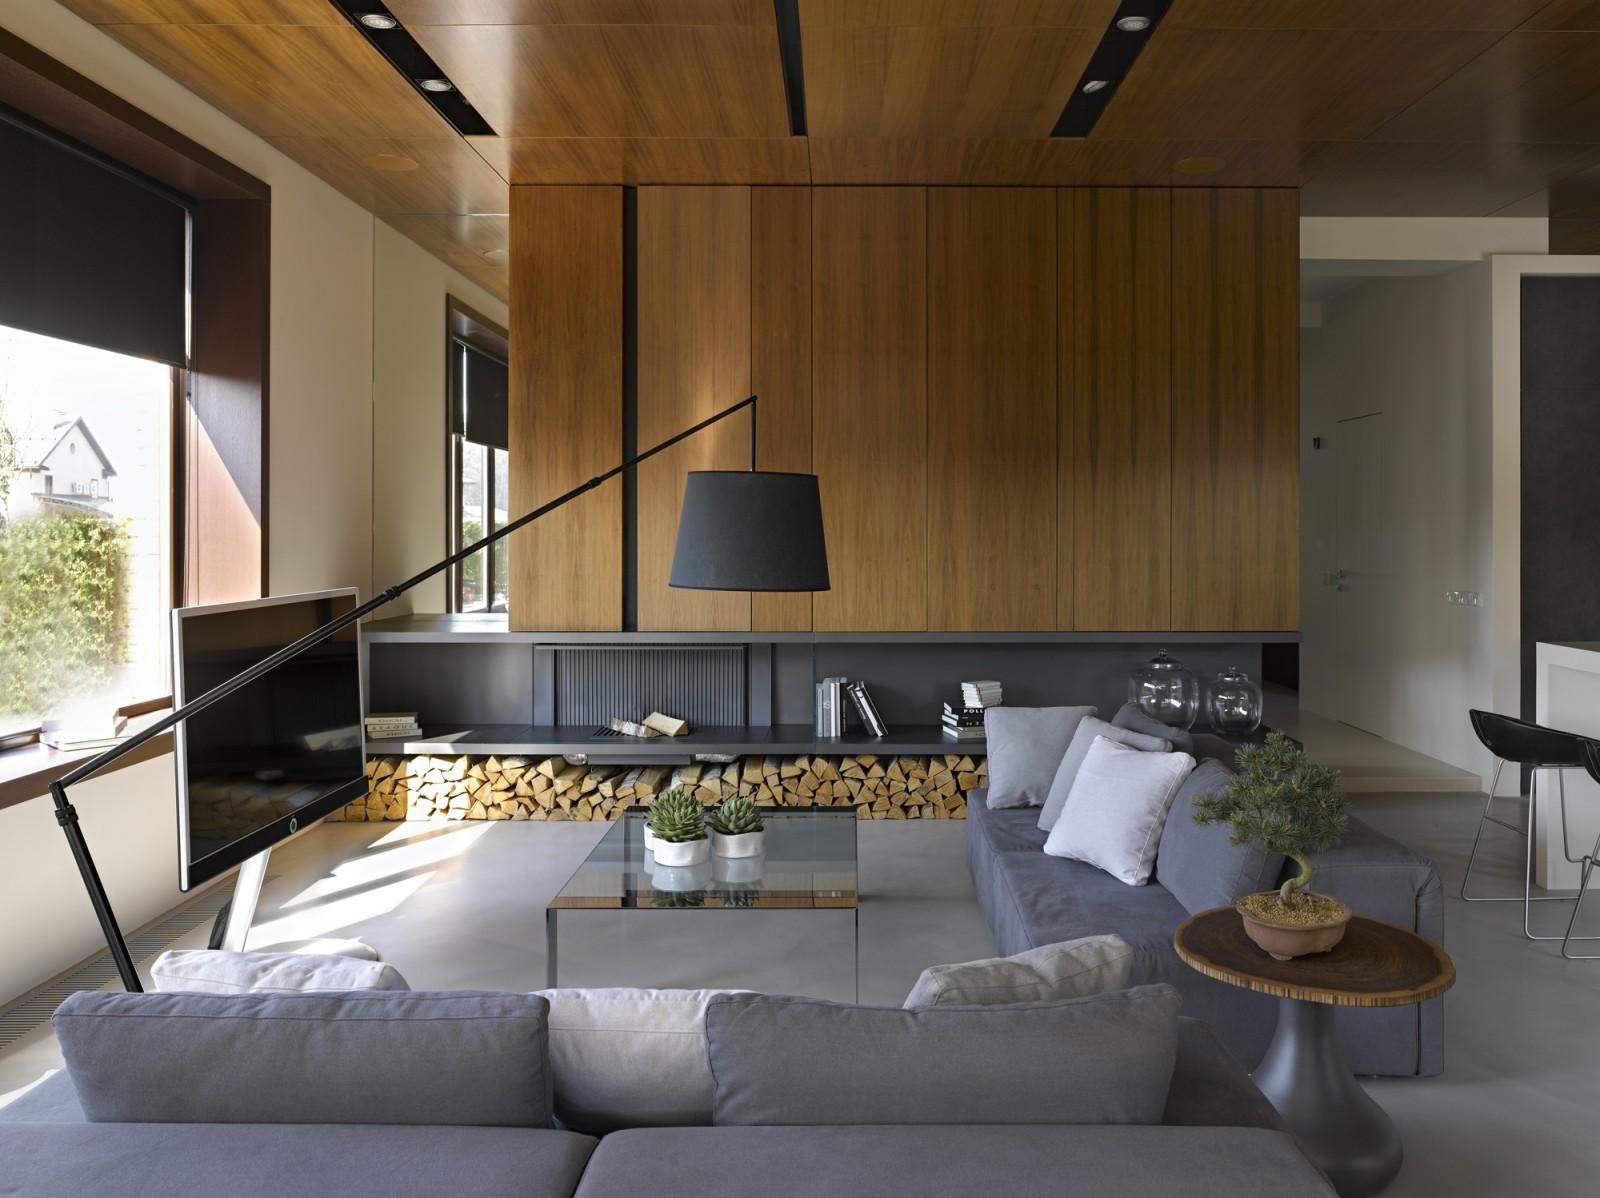 Nice villa interior by architectural Bureau of Alexandra Fedorova - 01